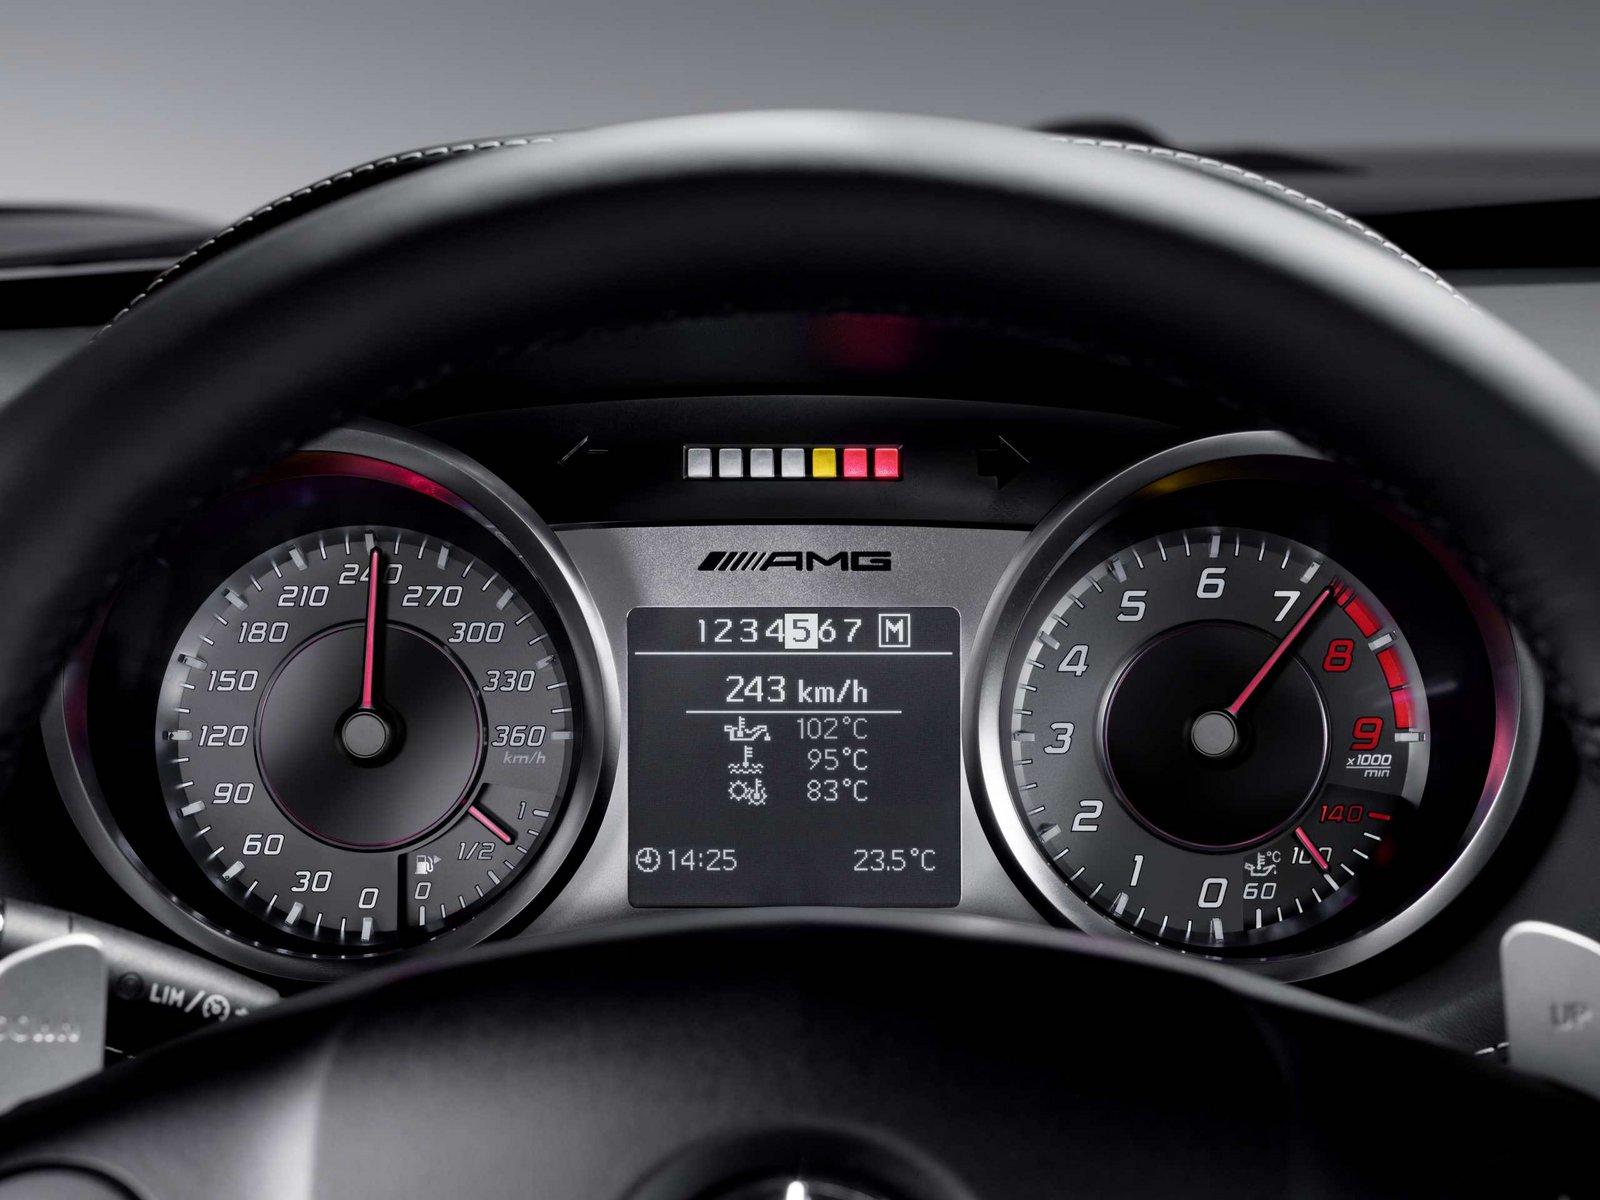 Wednesday Wallpaper: Mercedes-Benz SLS AMG - Speed:Sport:Life